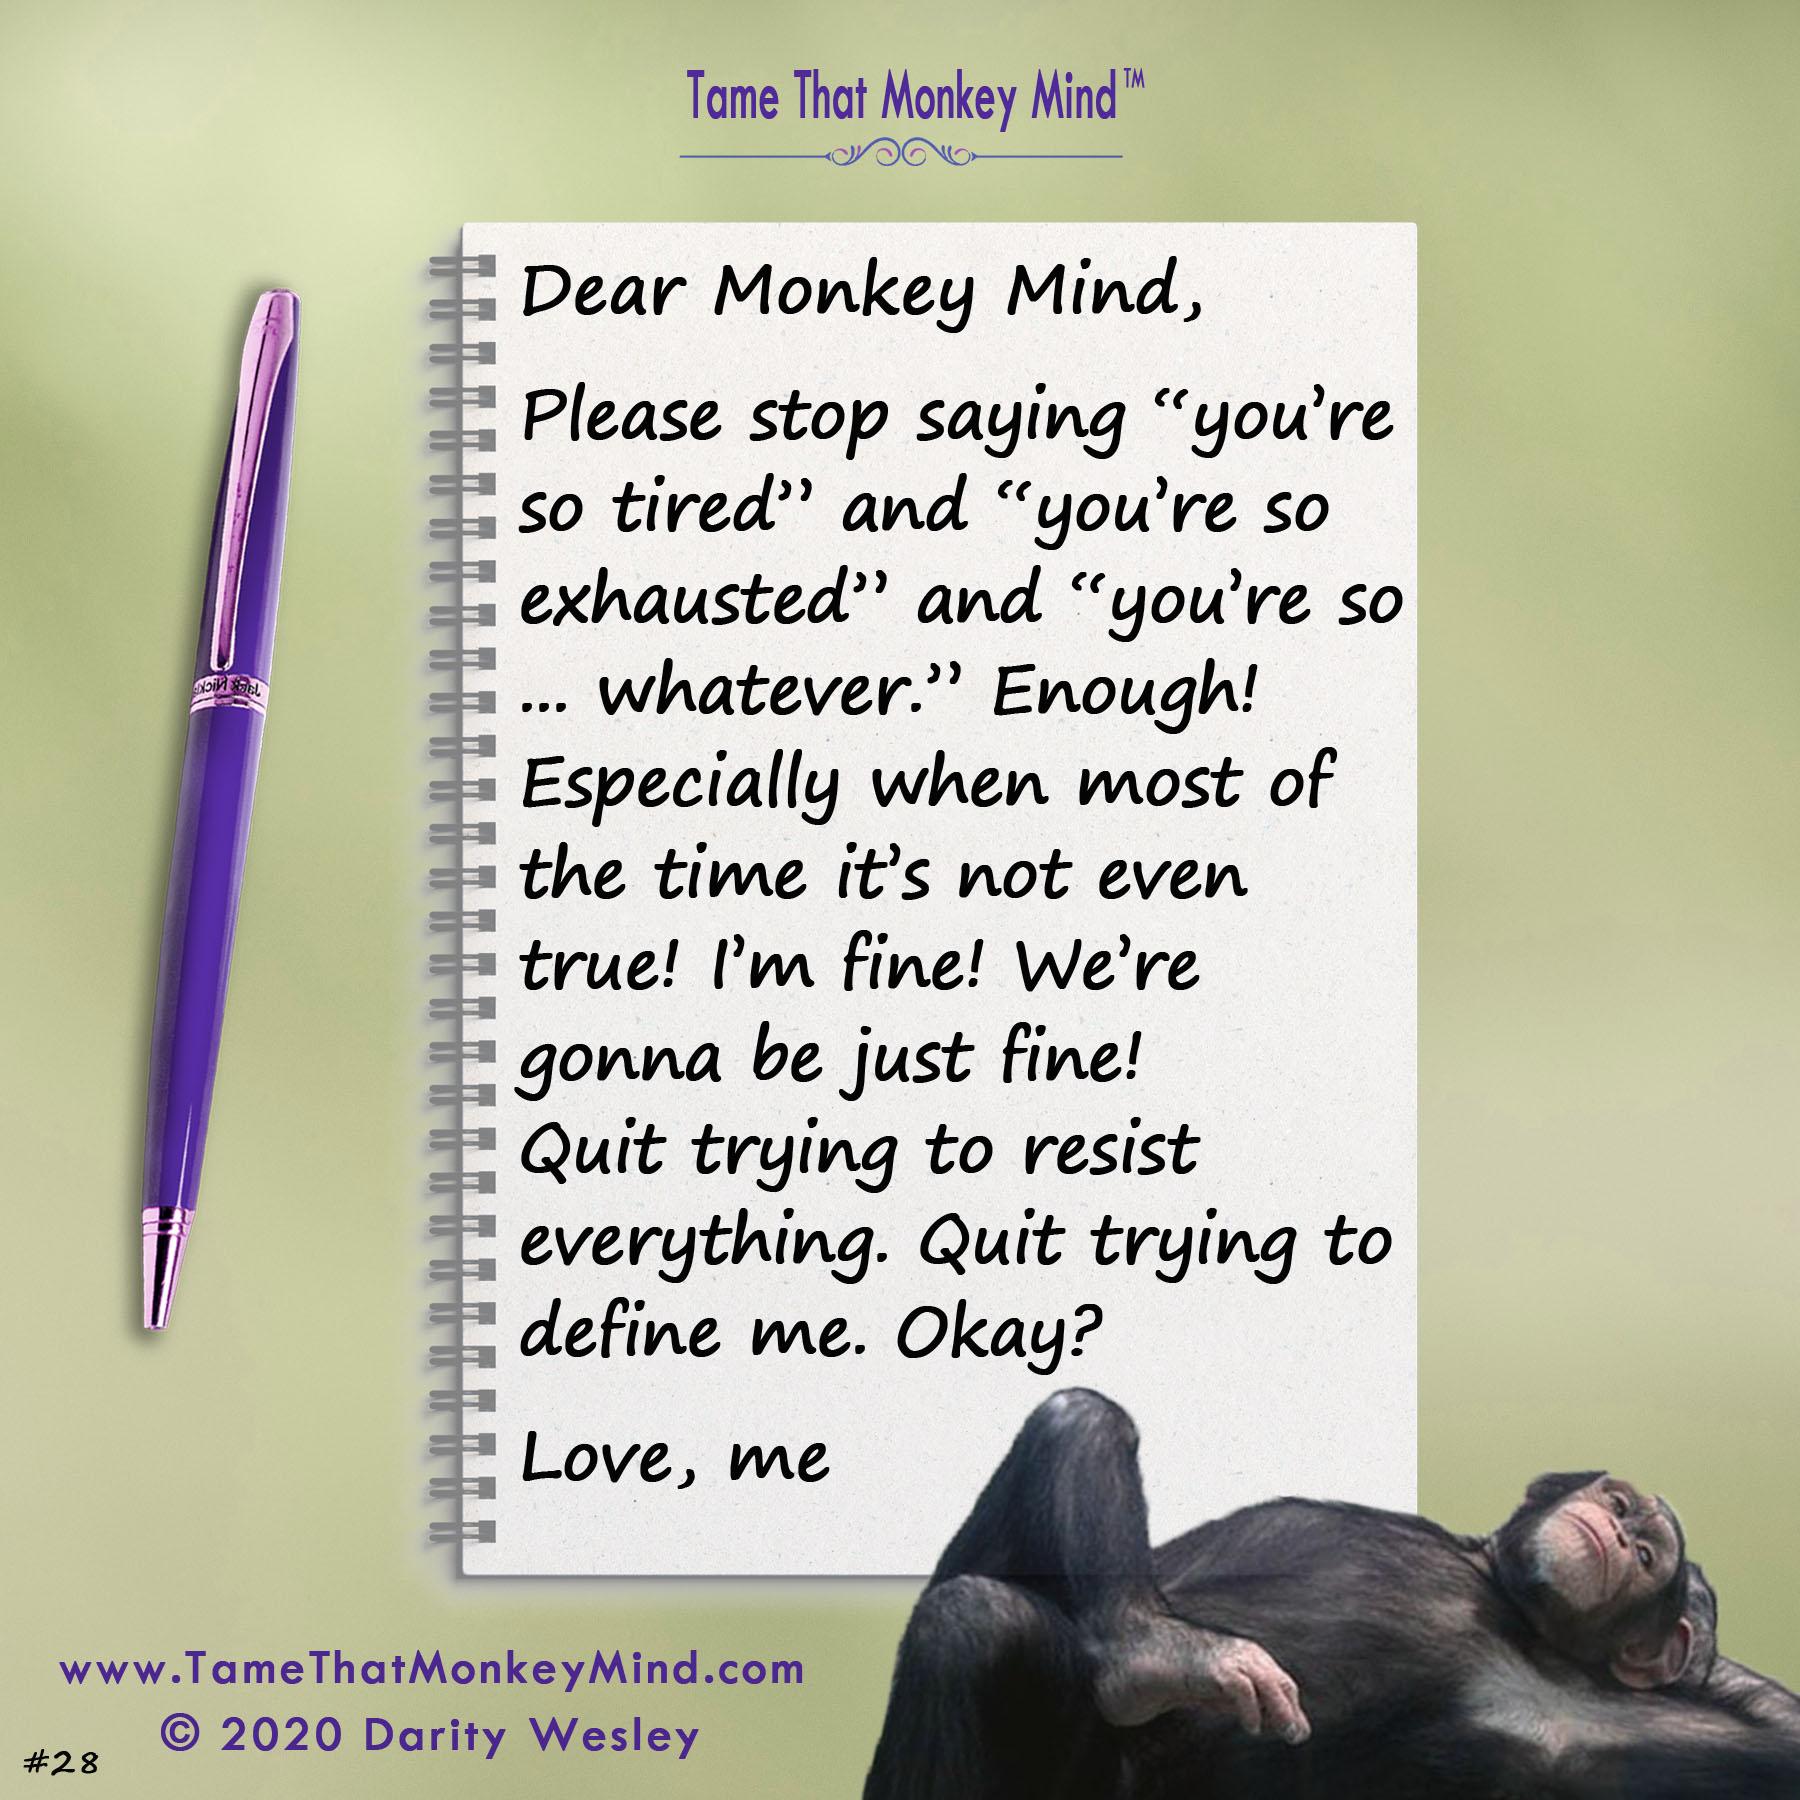 Dear Monkey Mind #28